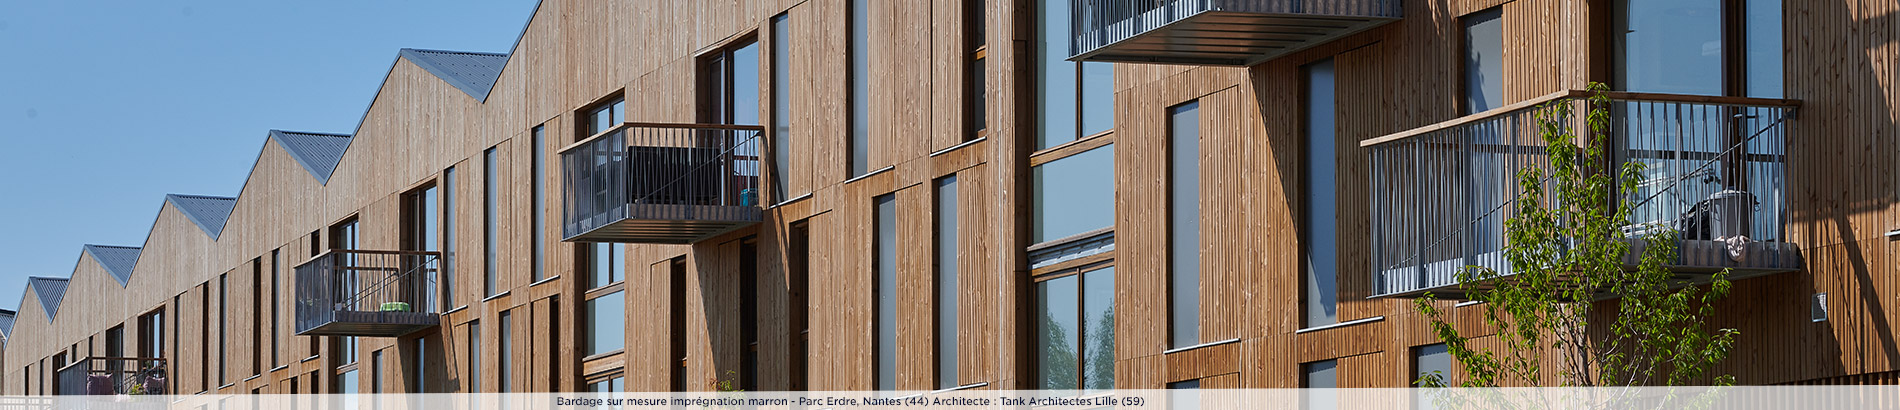 bardage-bois-impregnation-marron-piveteaubois-tank-architectes-lille-001